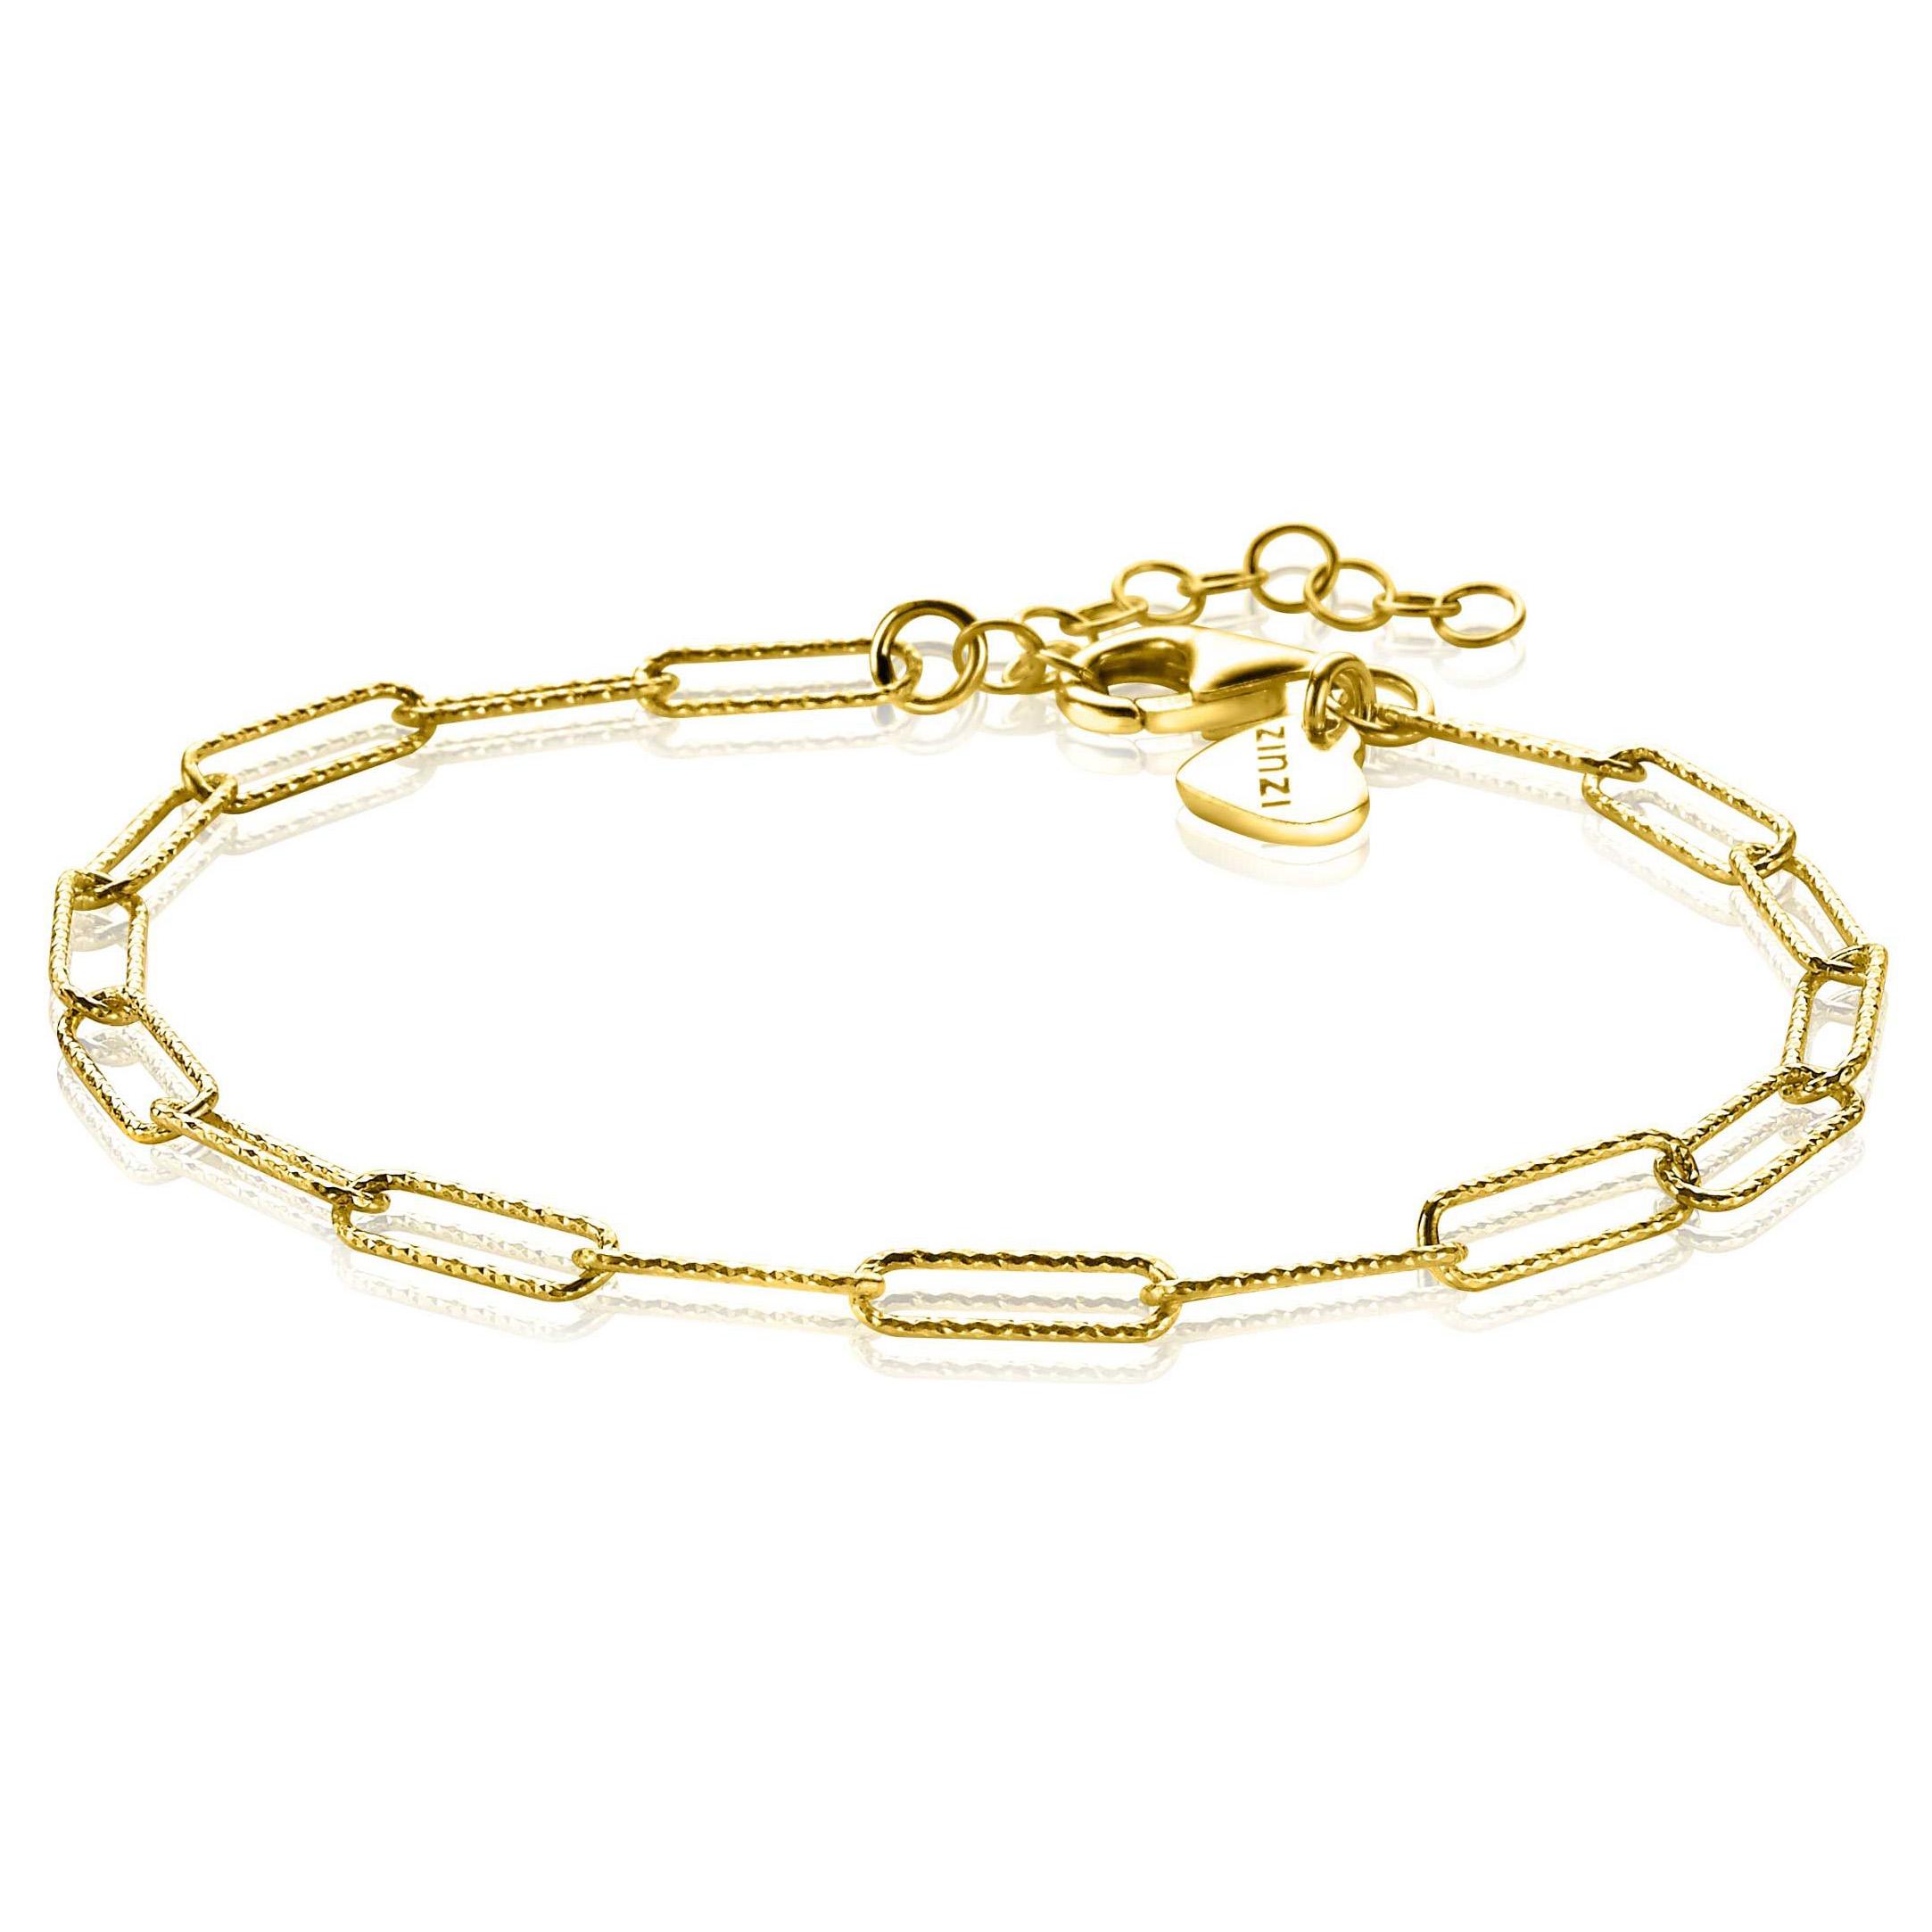 Zinzi ZIA1992G Armband Ovaal zilver goudkleurig 18 20 cm